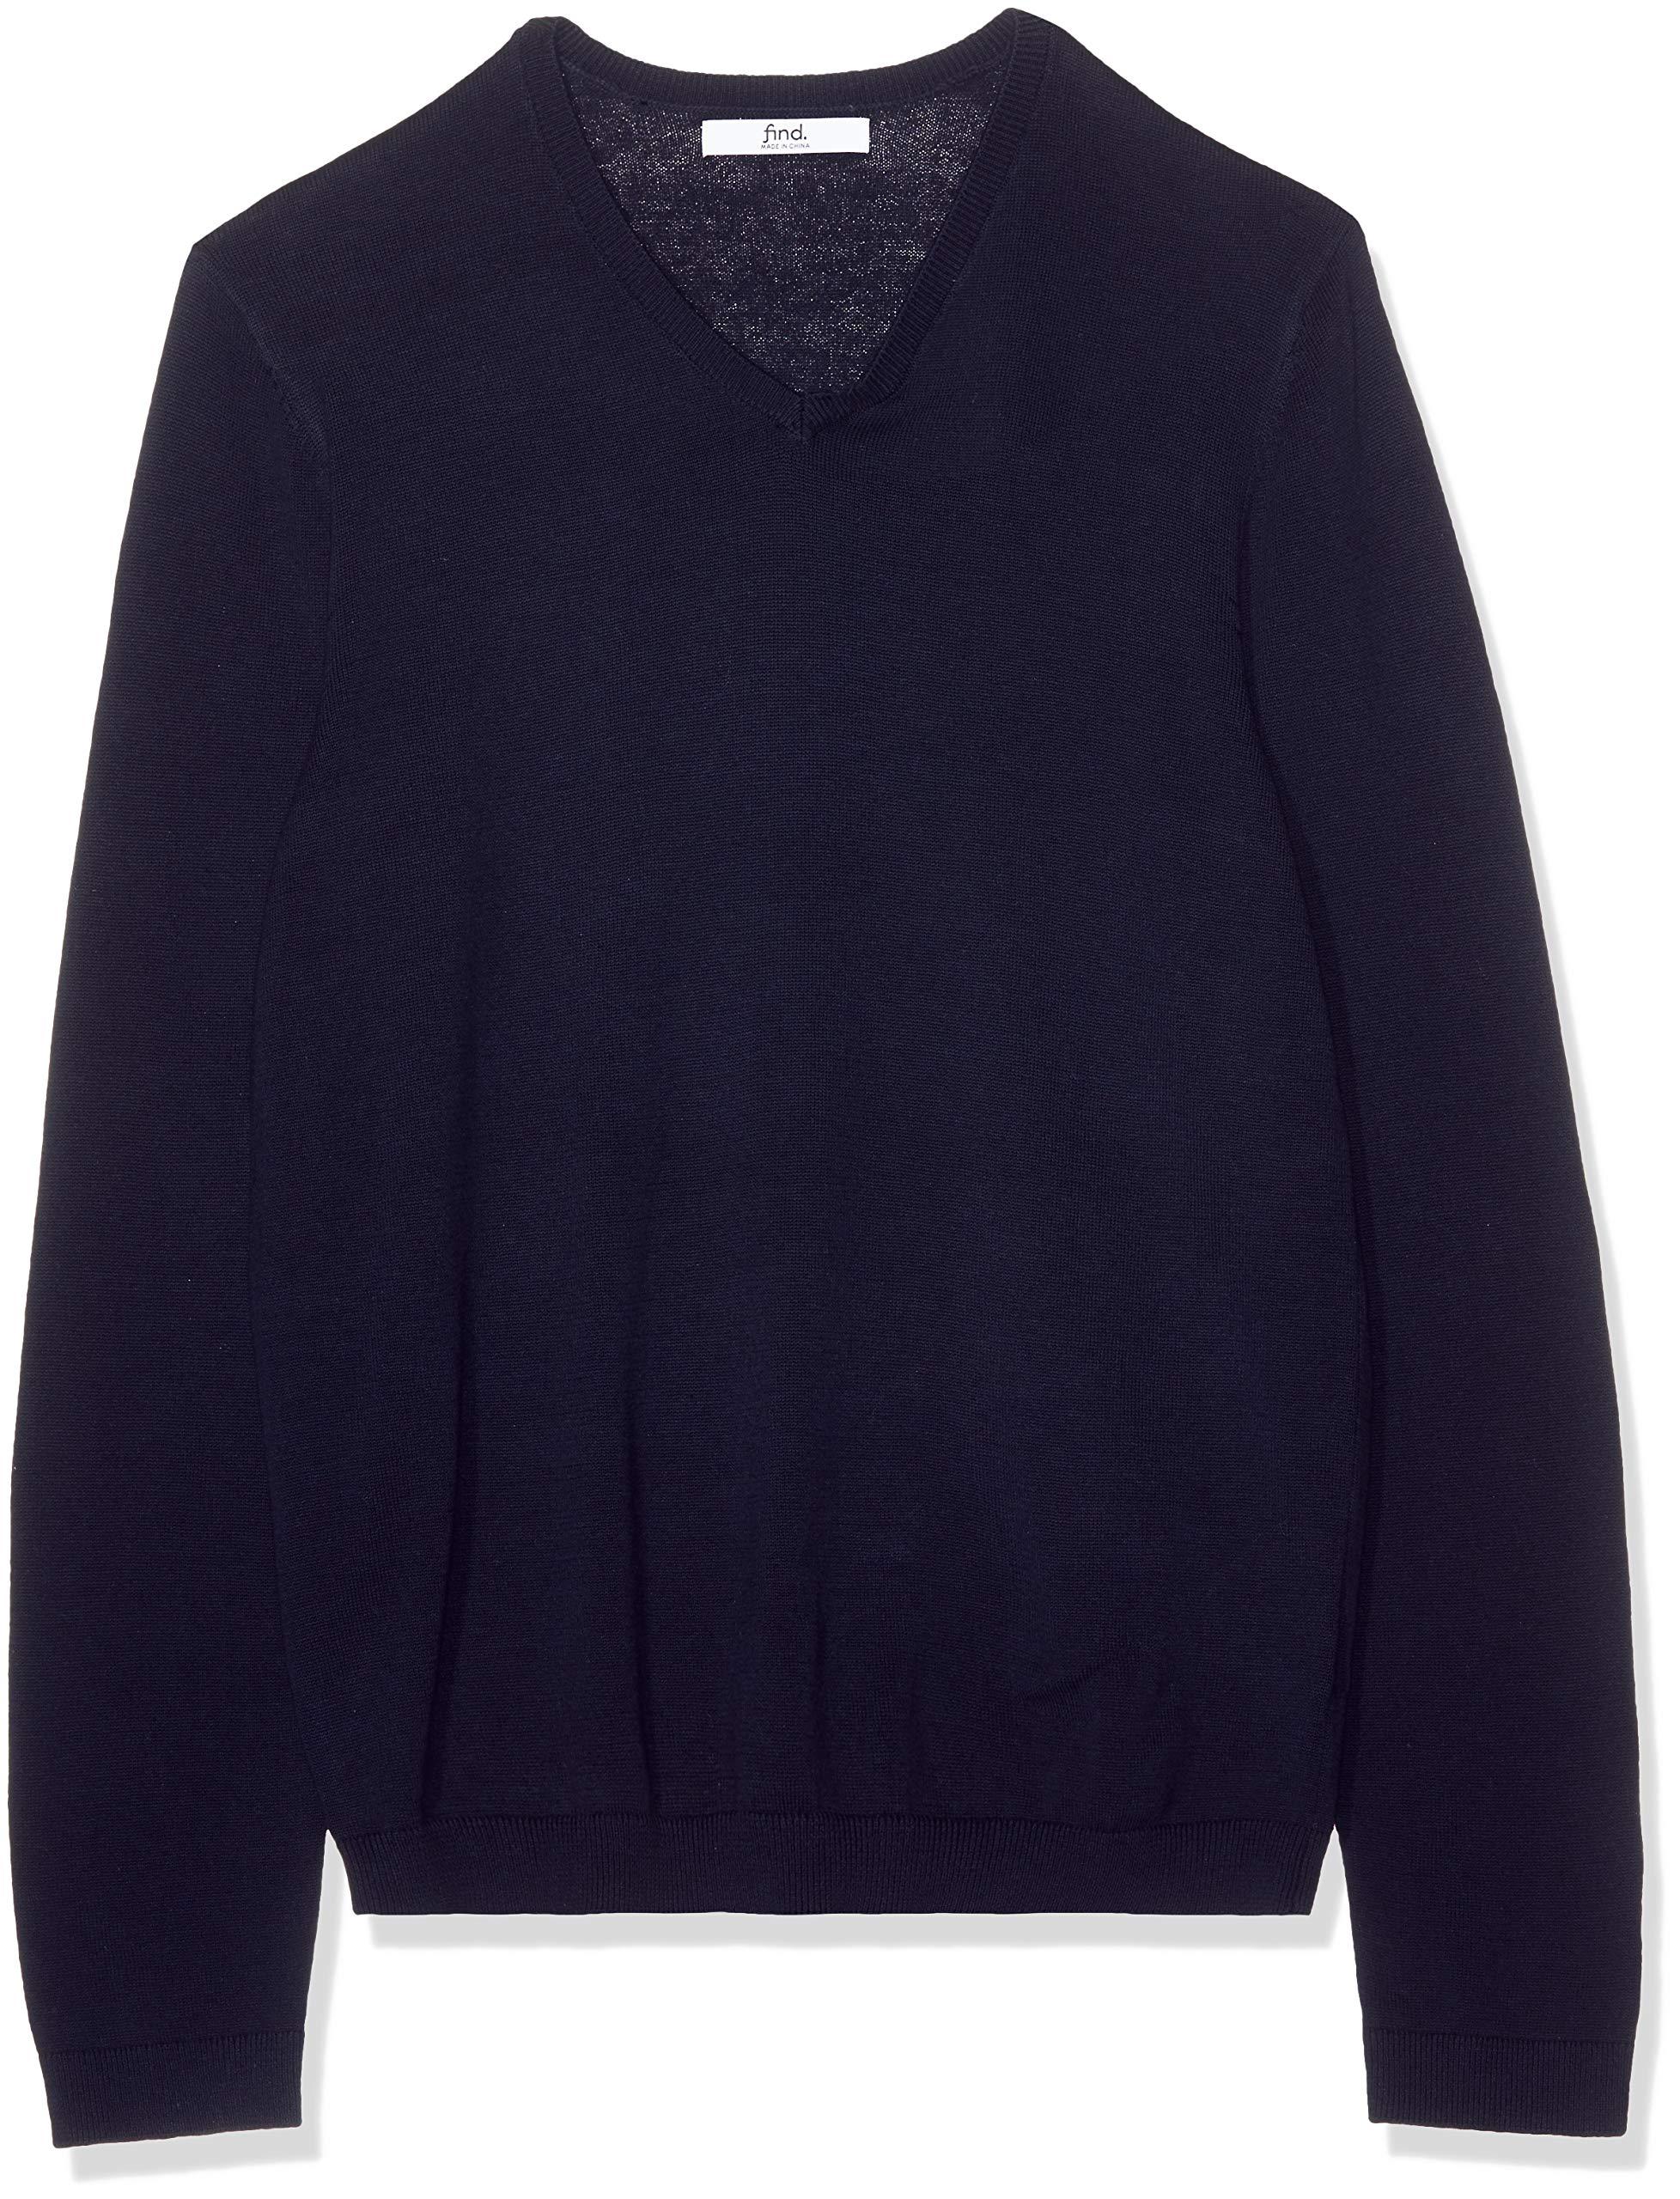 find. Men's Cotton V-Neck Sweater, Blue (Navy), Medium